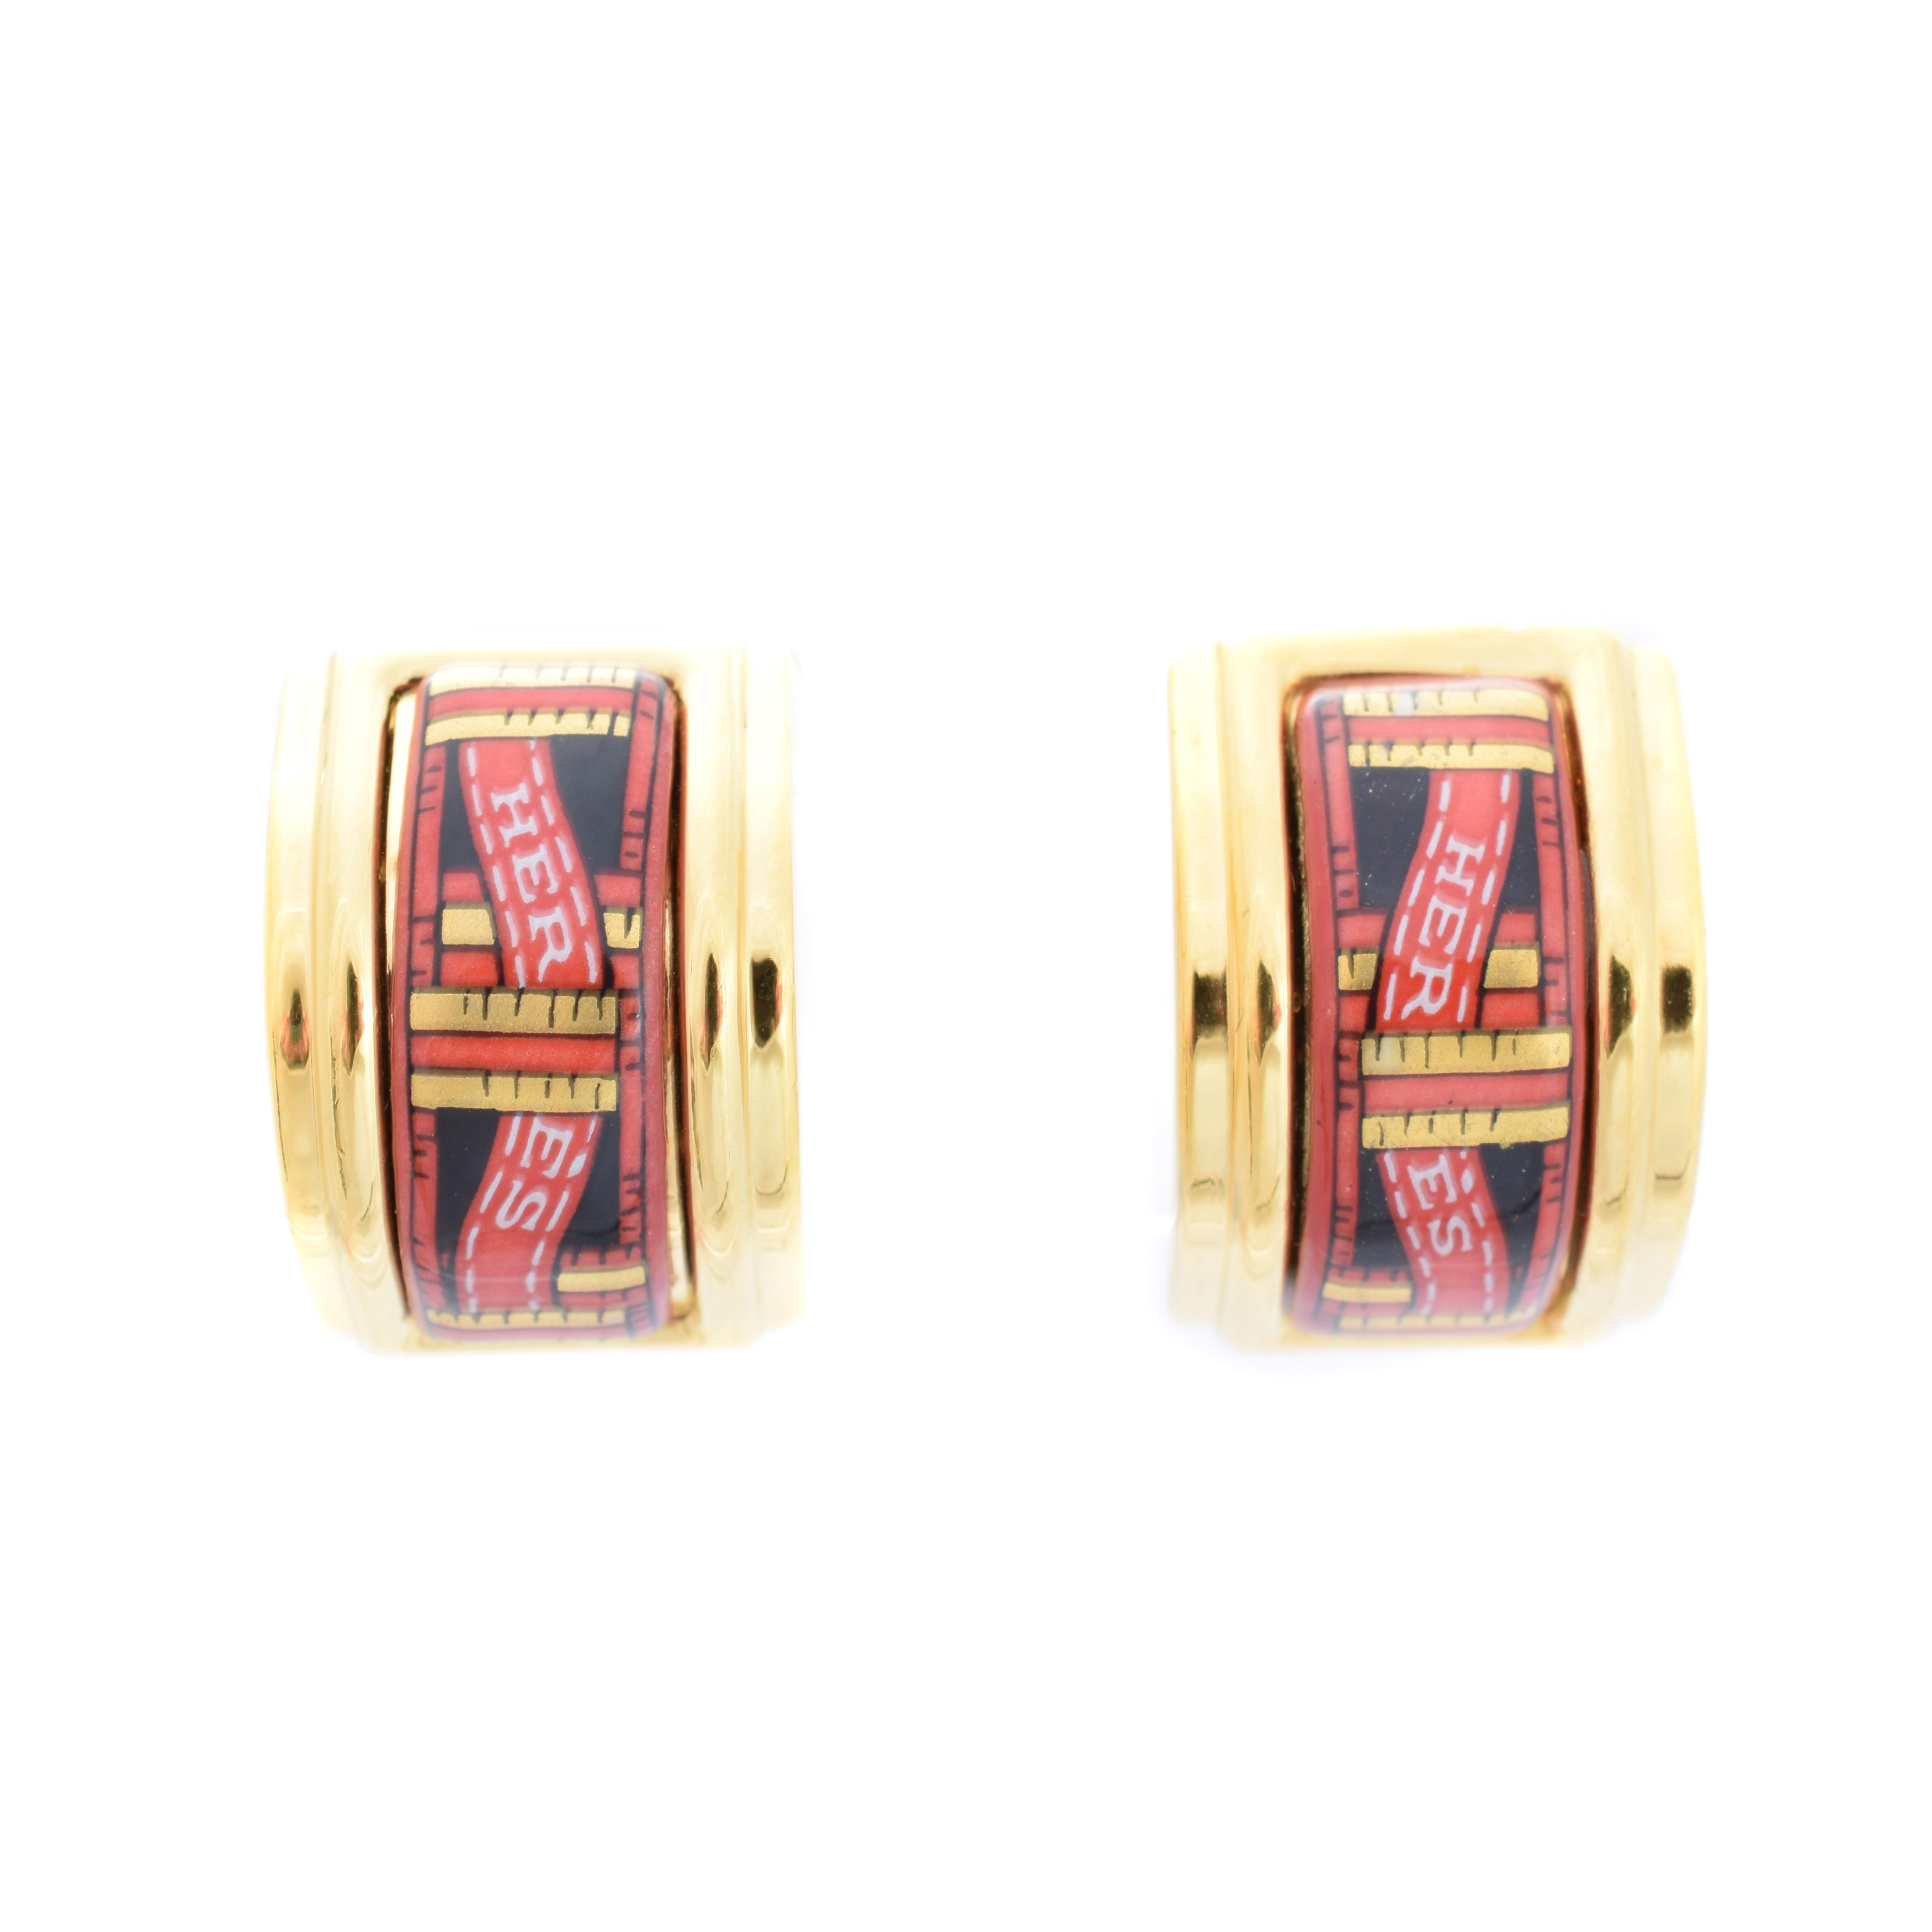 A pair of Hermes logo ribbon earrings, - Image 2 of 2